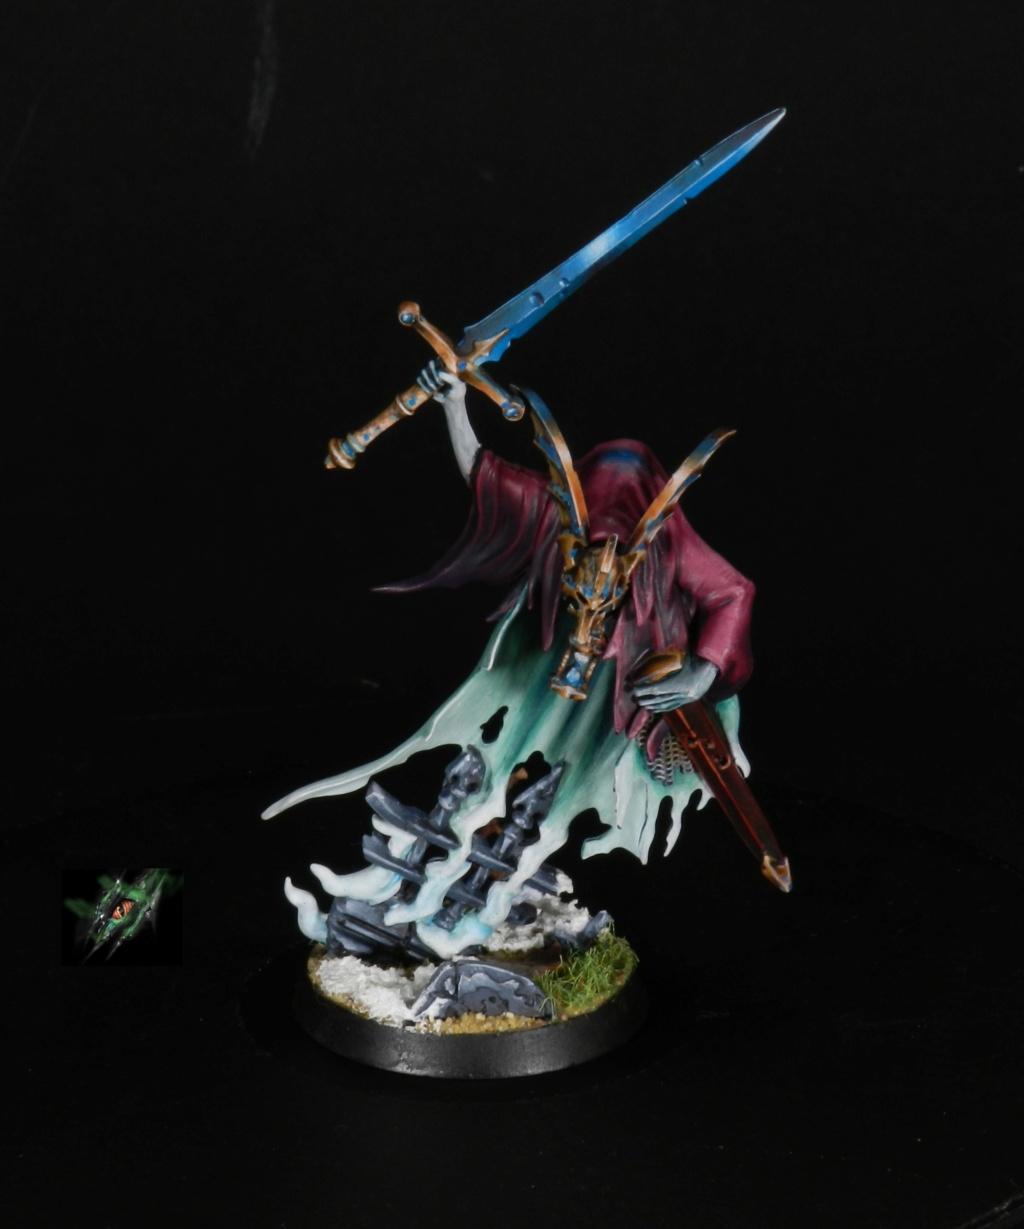 Les figurines de Flako Dscn4812